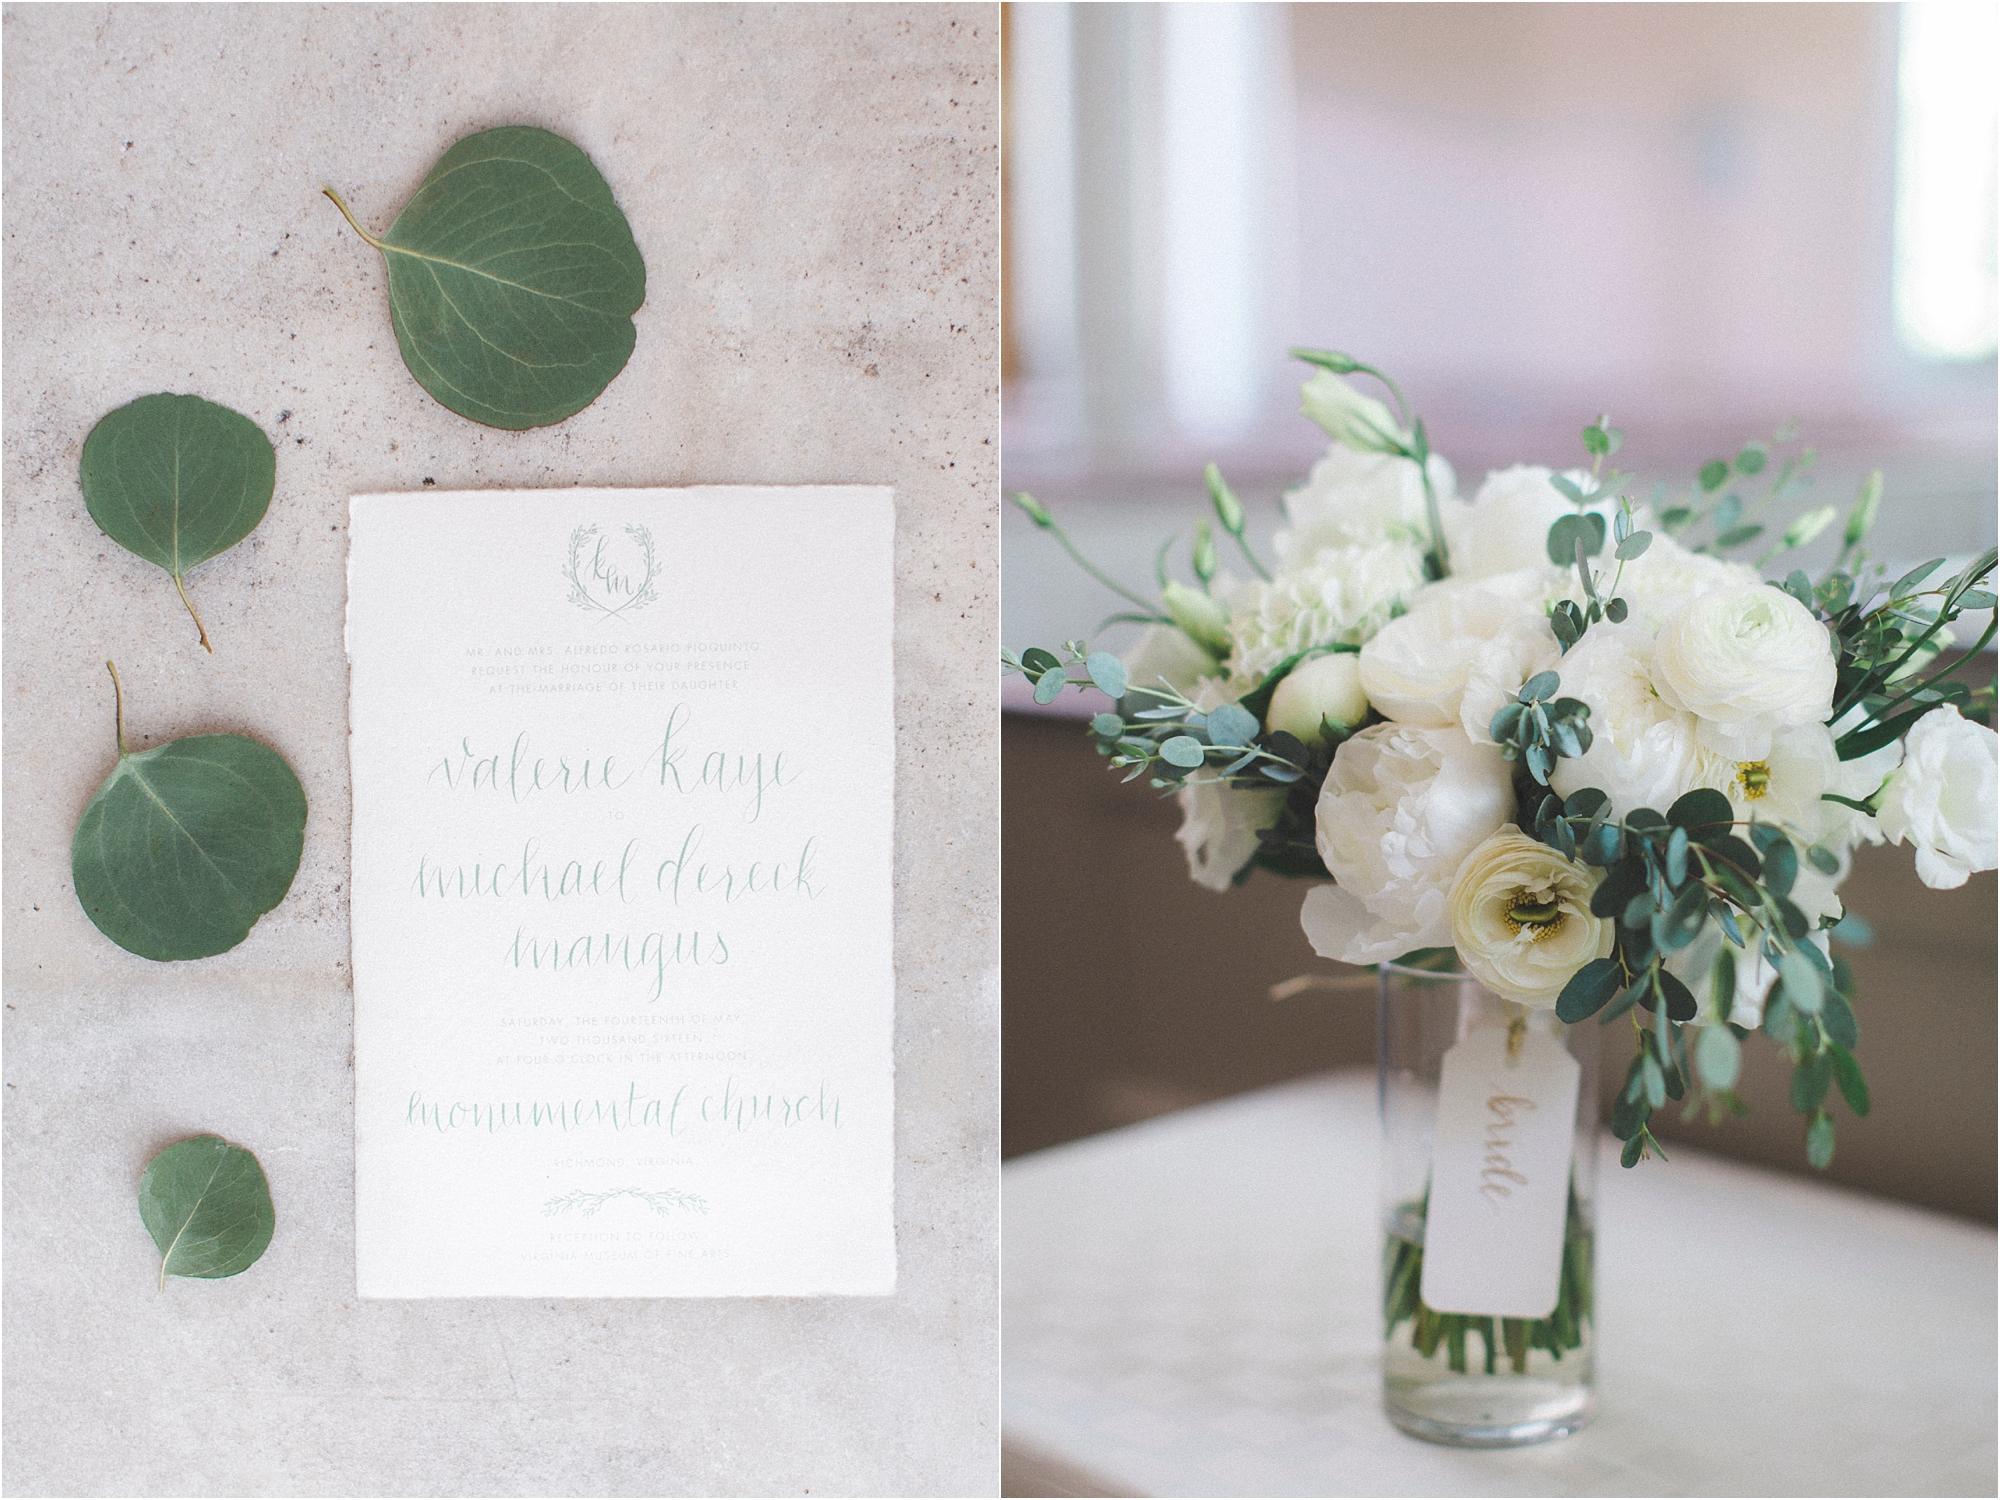 stephanie-yonce-photography-historic-church-virginia-museu-fine-arts-wedding-photos_016.JPG